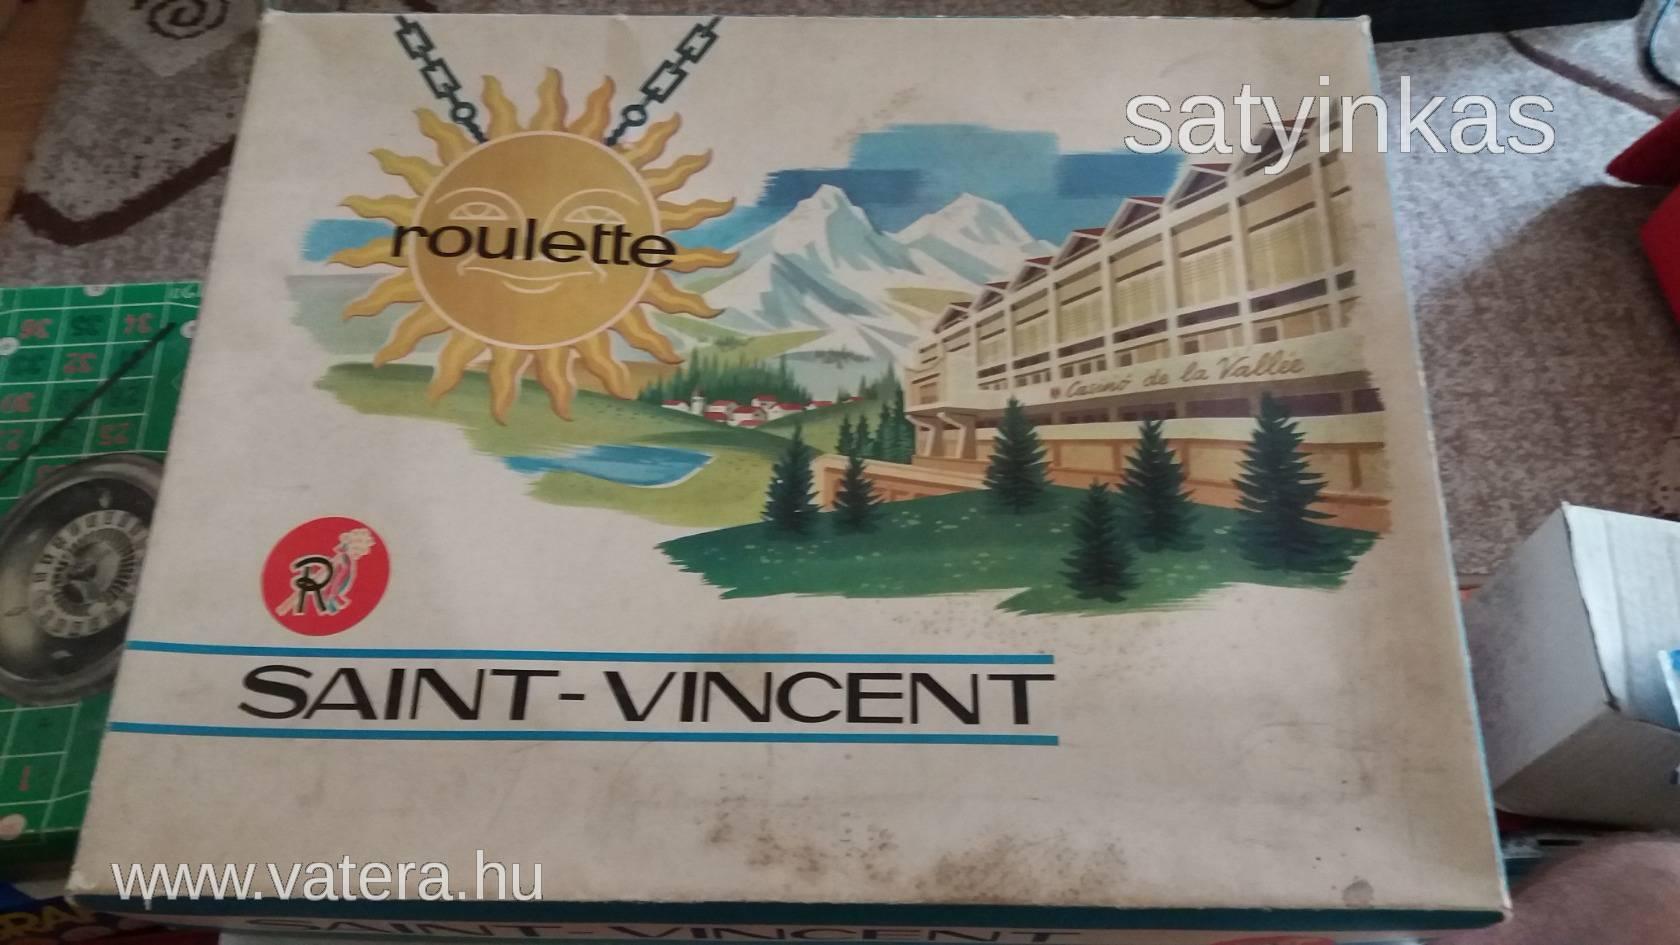 roulette-saint-vincent-rulettjatek-a9aa_1_big.jpg